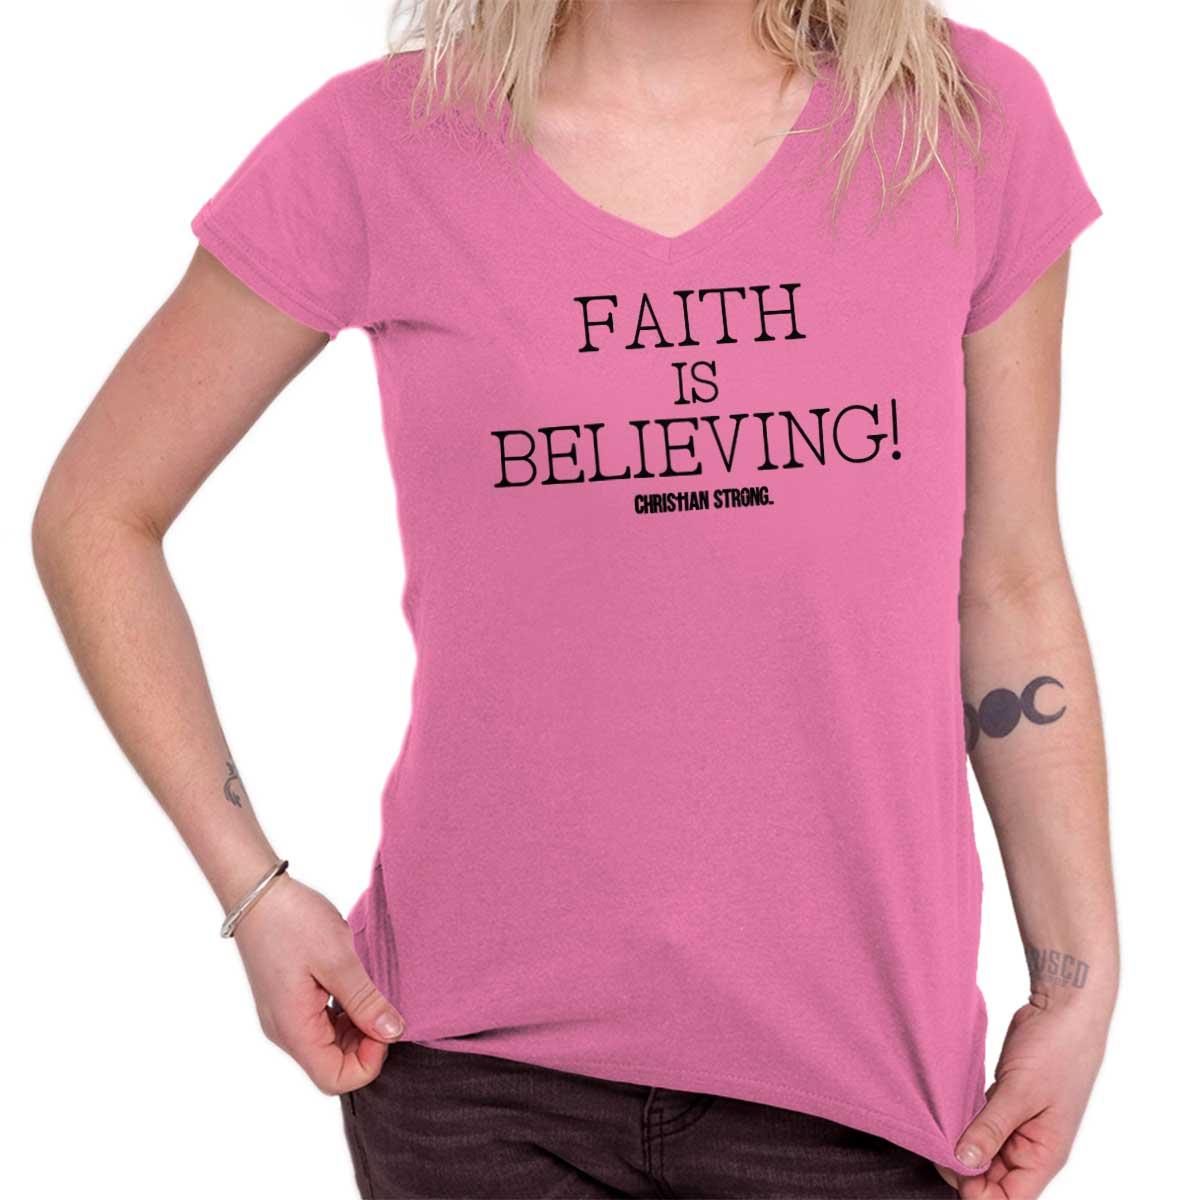 ddf2b45540 Faith Believing Christian Shirt | Jesus Christ God Religious Junior Fit  V-Neck T Shirt